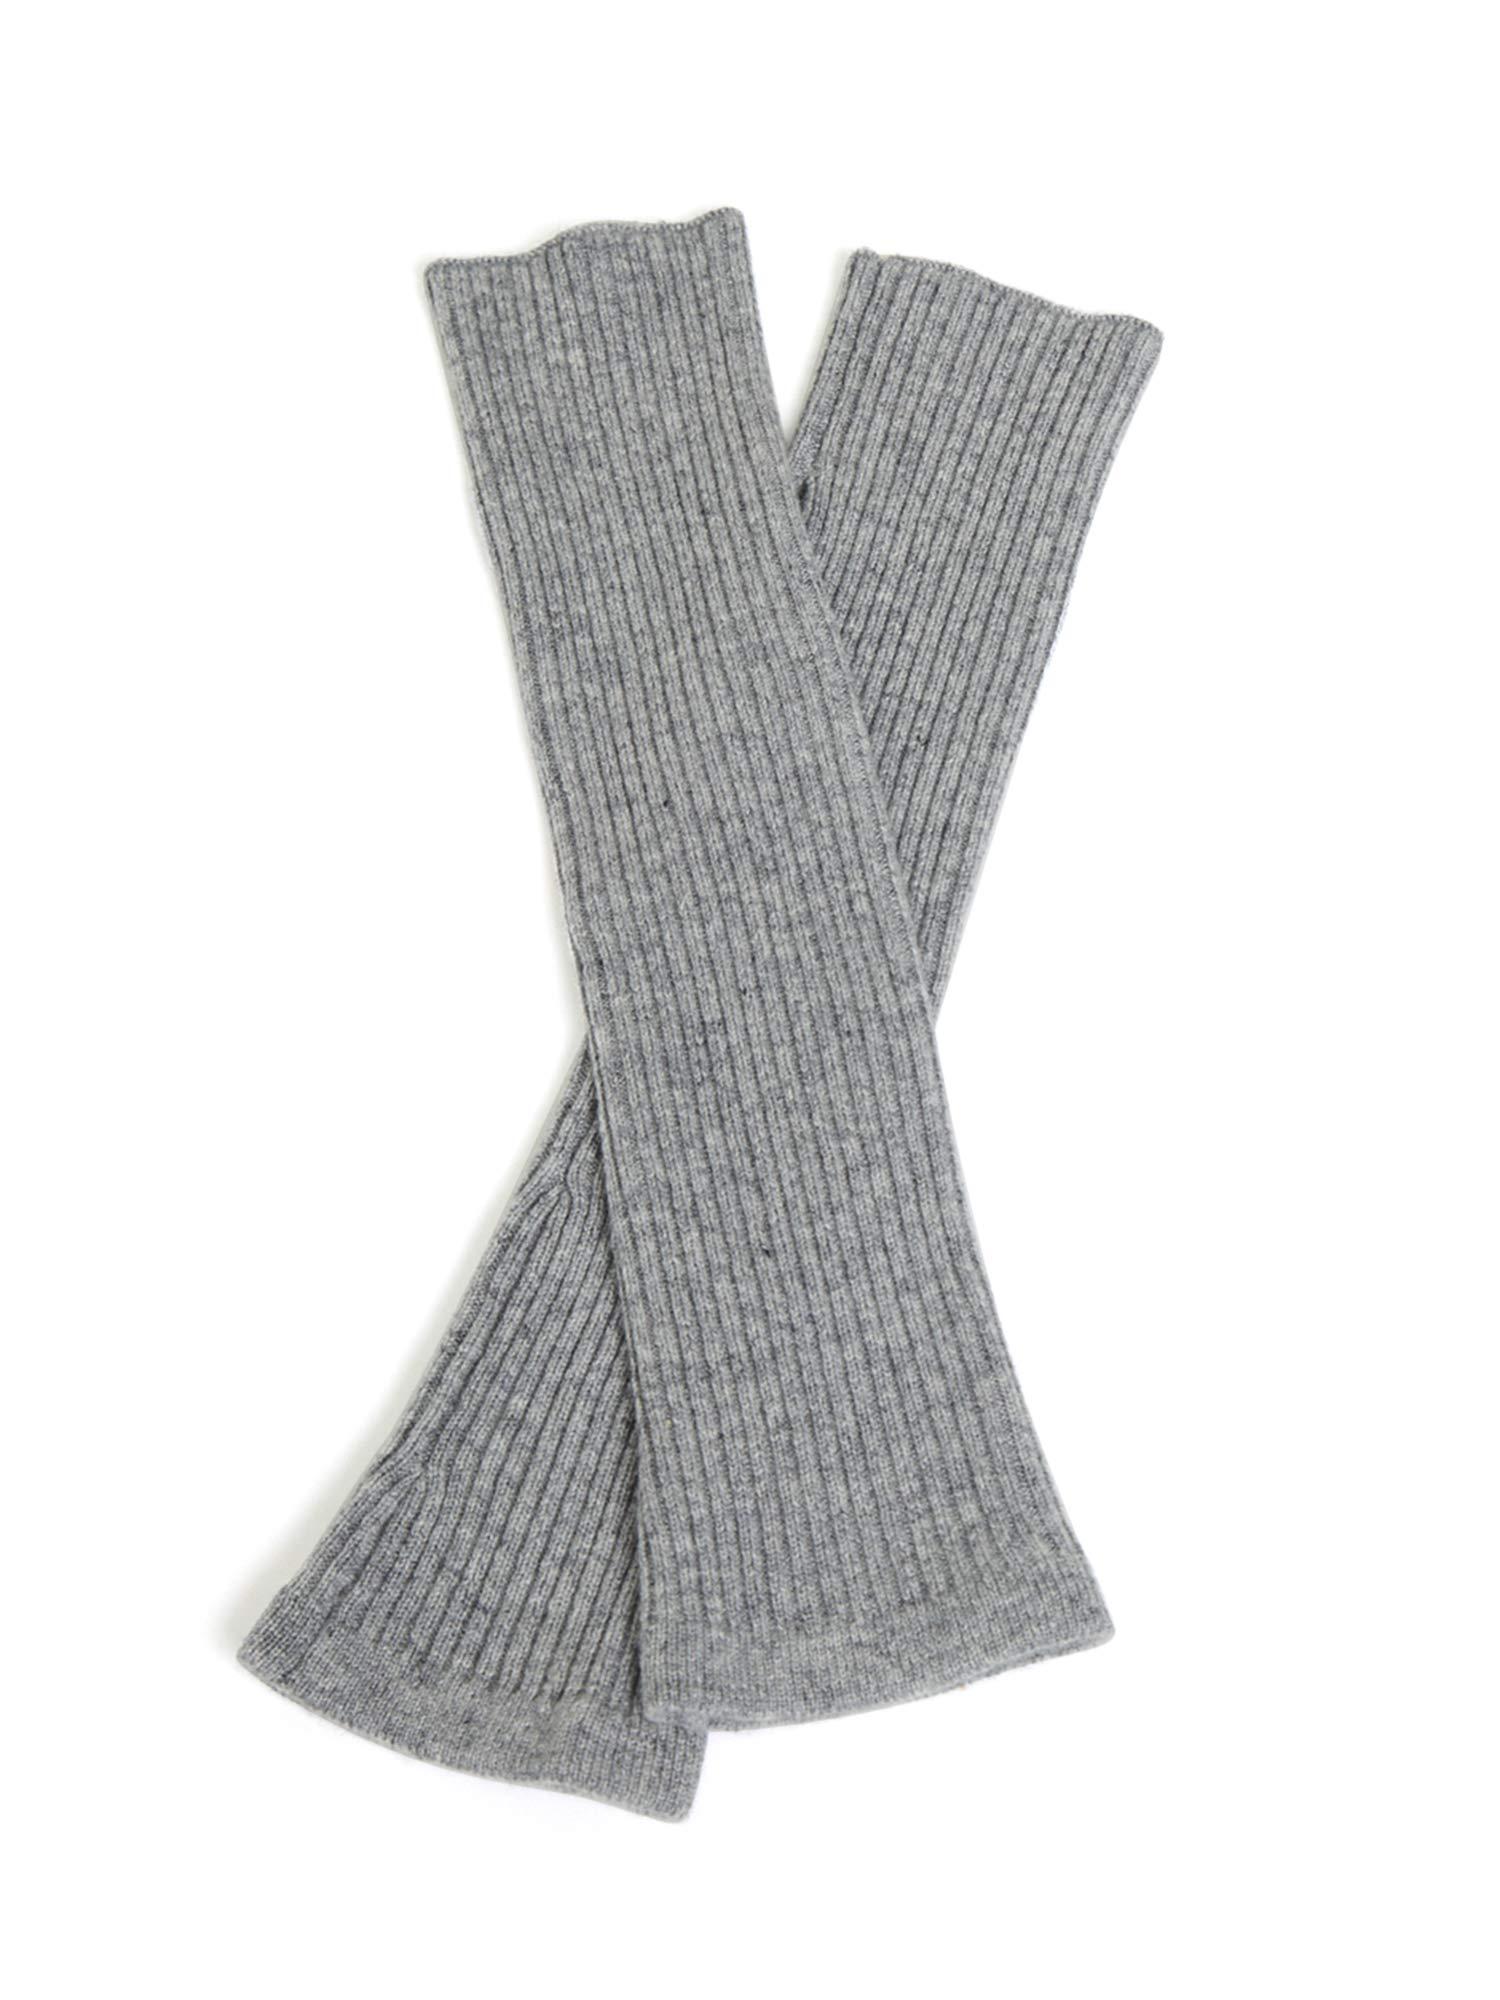 State Cashmere Women's 100% Cashmere Knit Long Fingerless Arm Warmers Mitten Gloves 13''